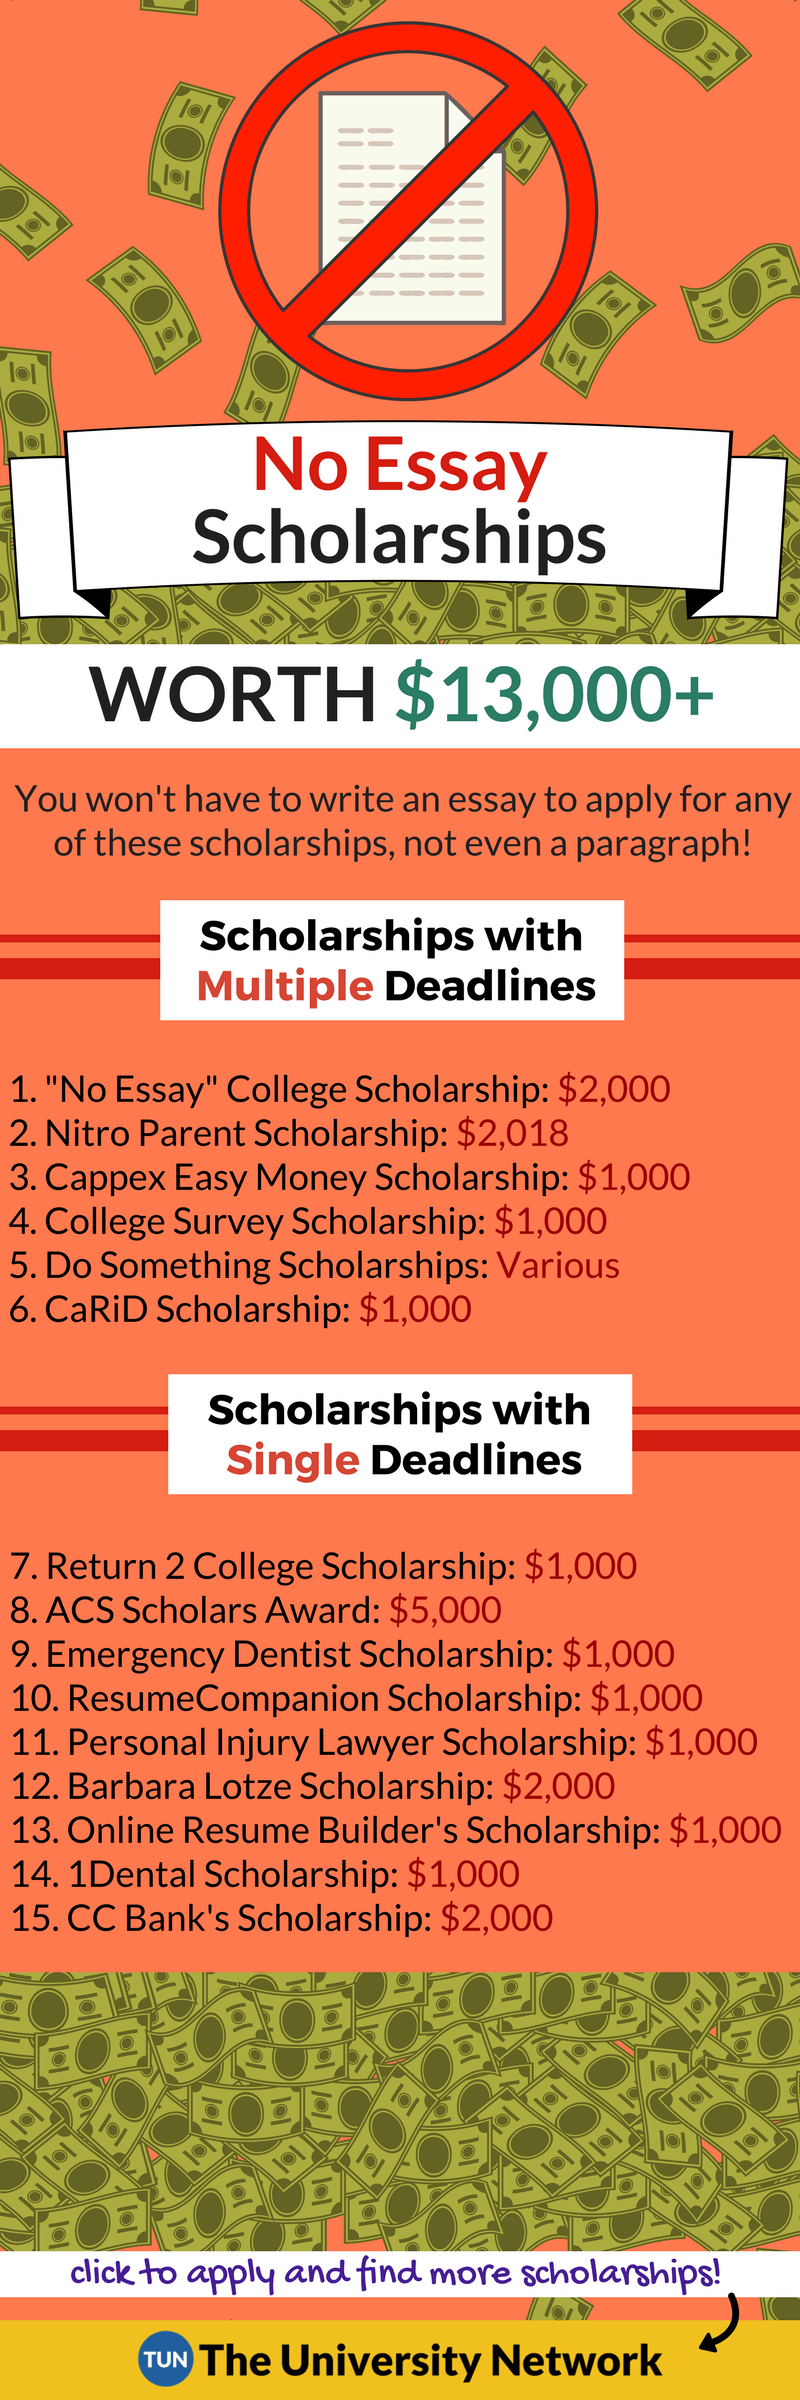 023 Easy No Essay Scholarships Example Striking 2015 2019 Full